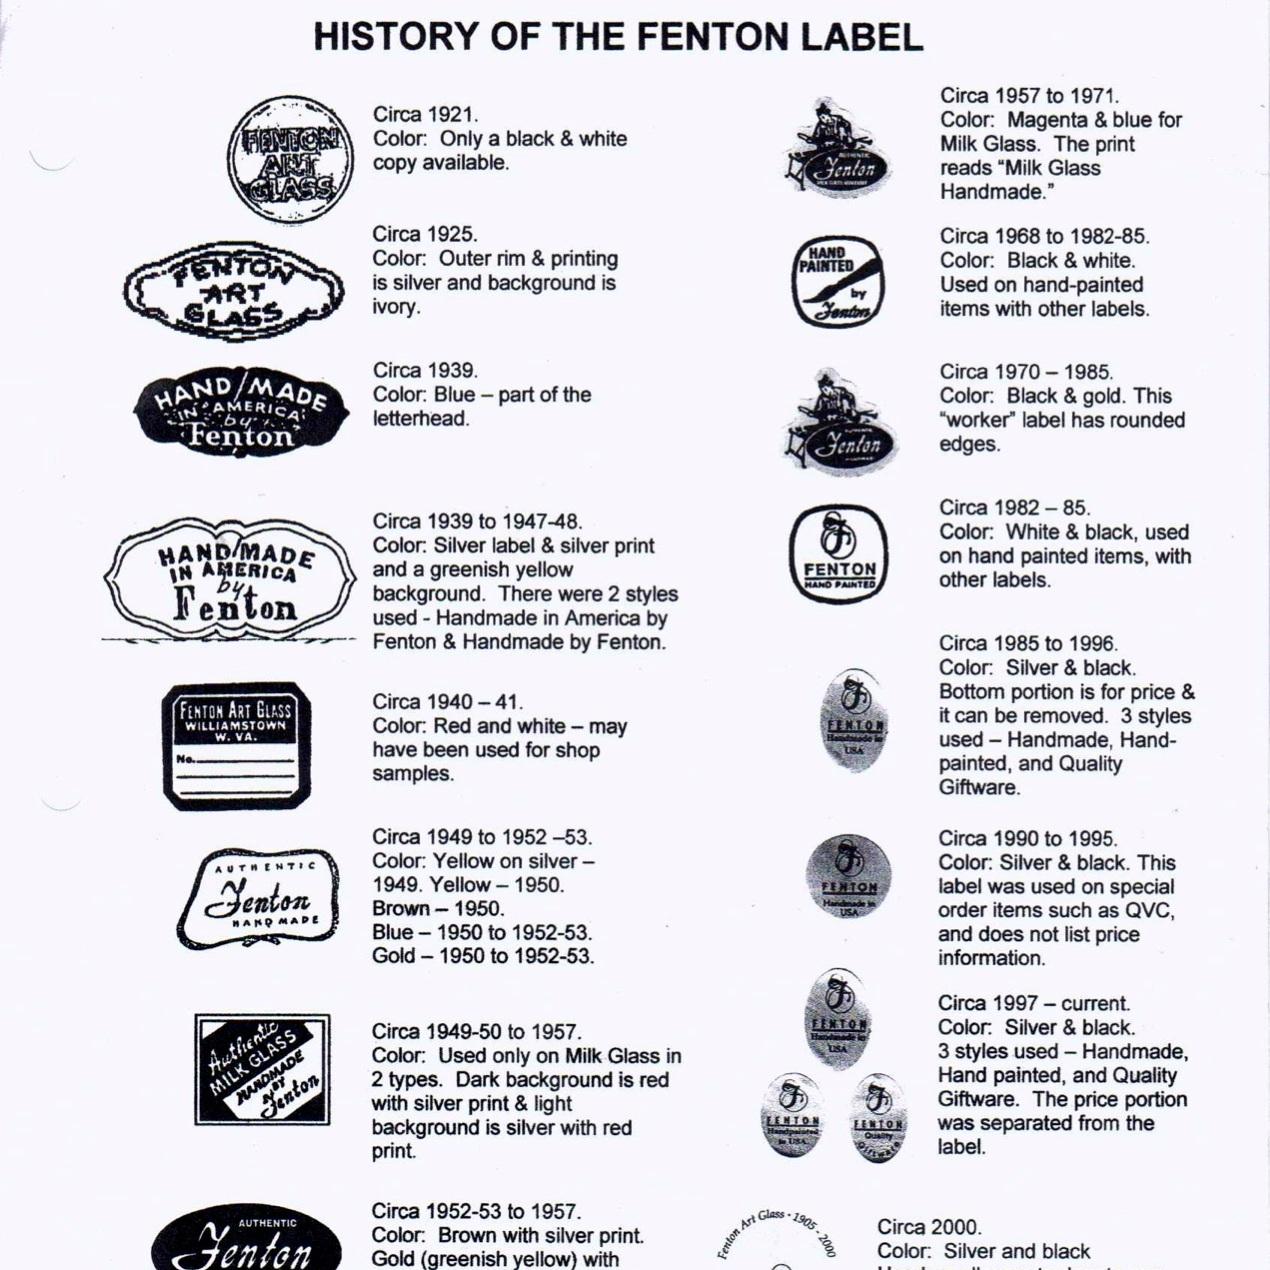 2005 History of the Fenton Label